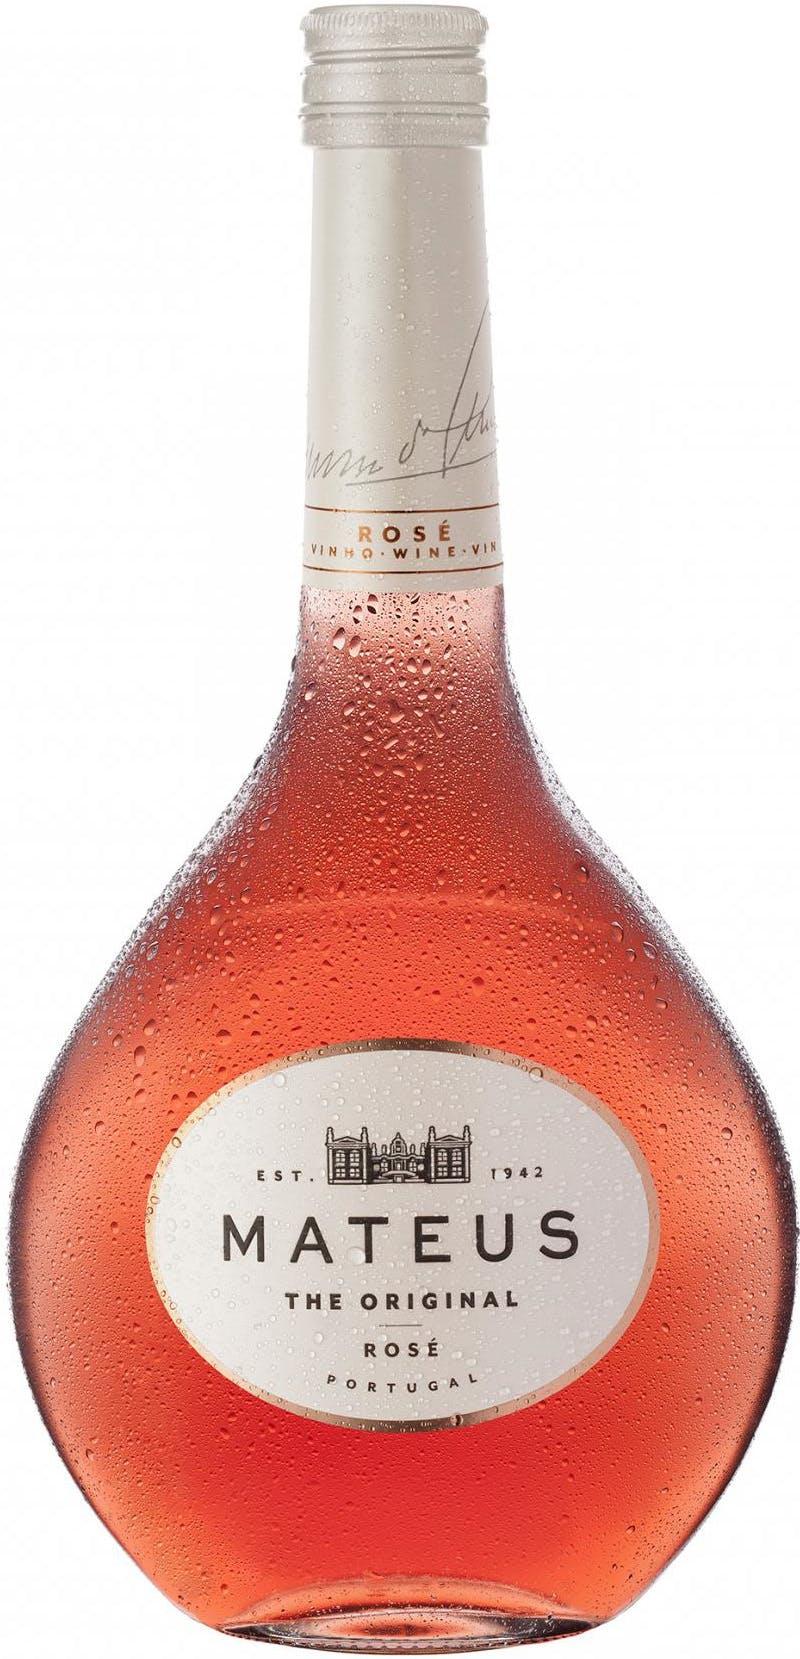 Mateus Rosé The Forked Vine